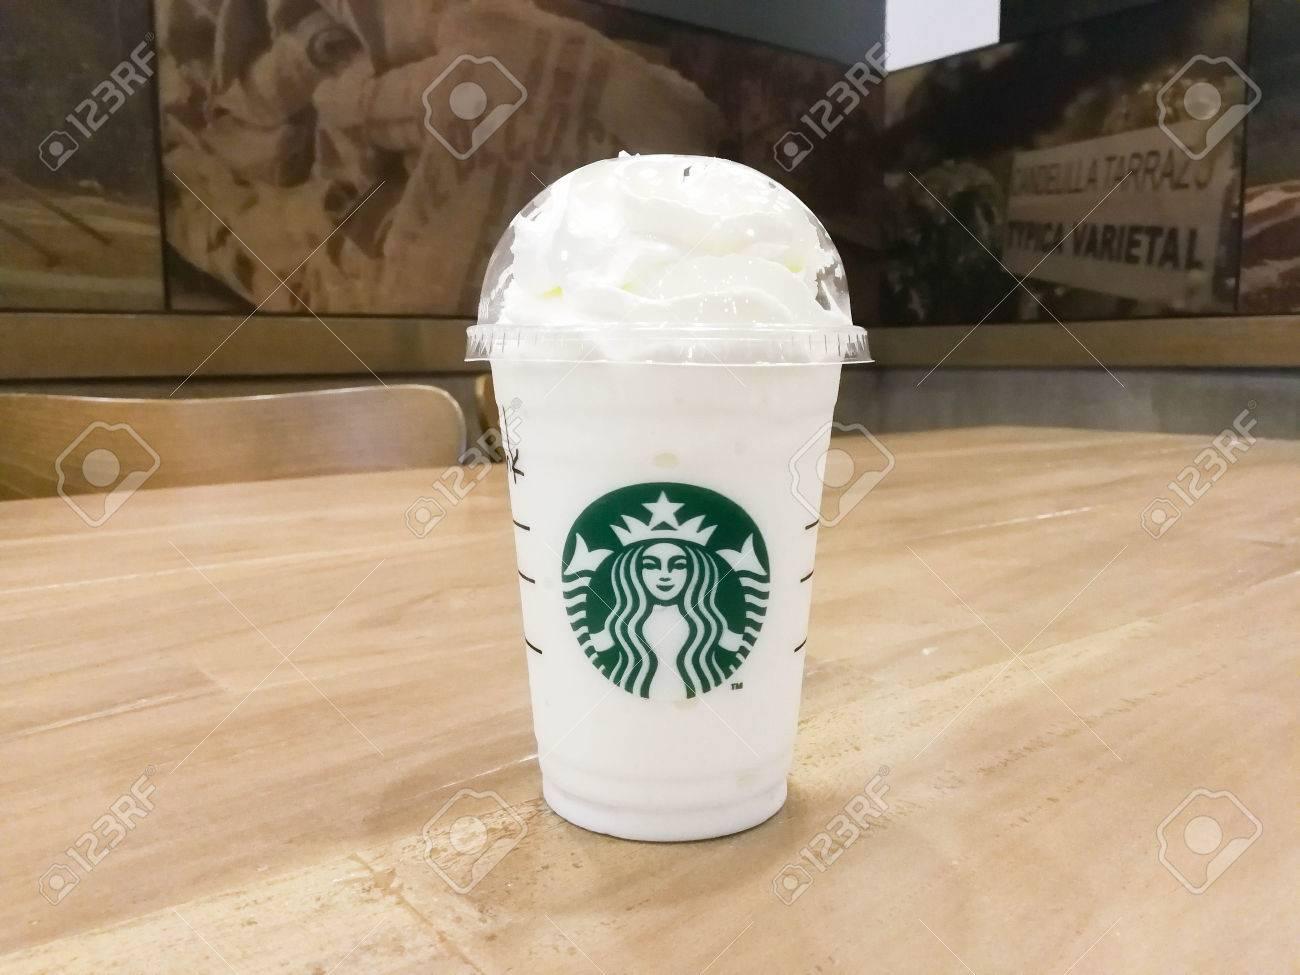 Bangkok Thailand Aug 30 2017 A Cup Of Starbucks Coffee